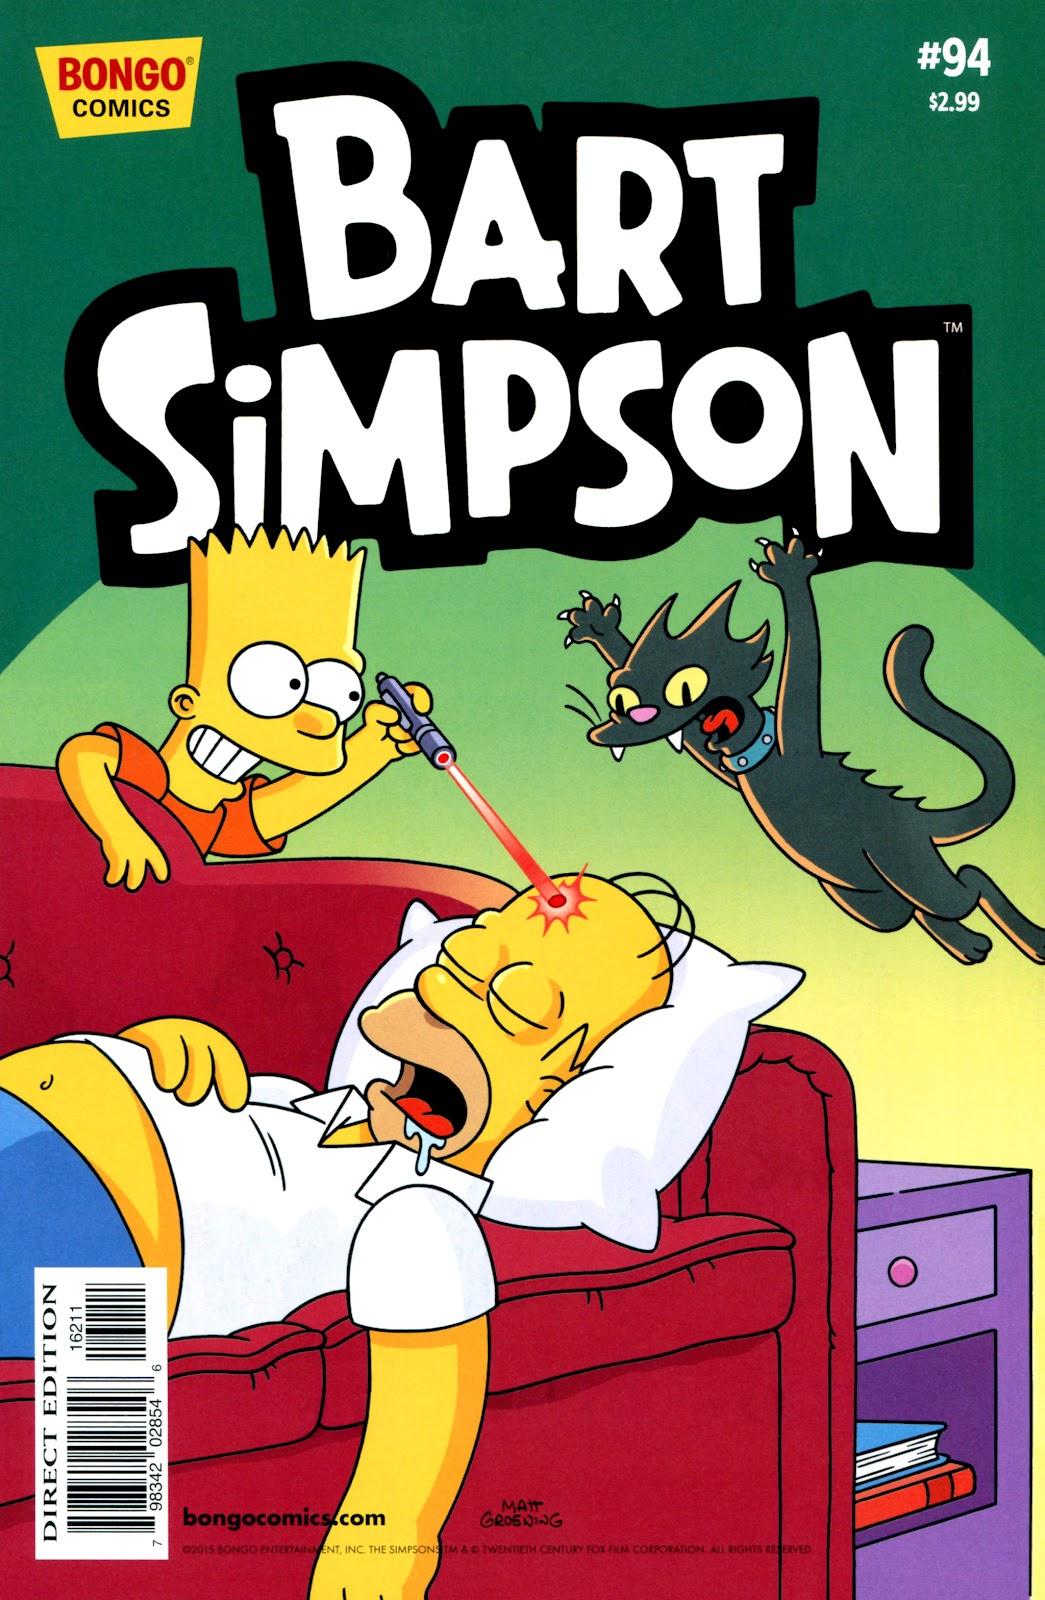 Simpsons Comics Presents Bart Simpson 94 Page 1